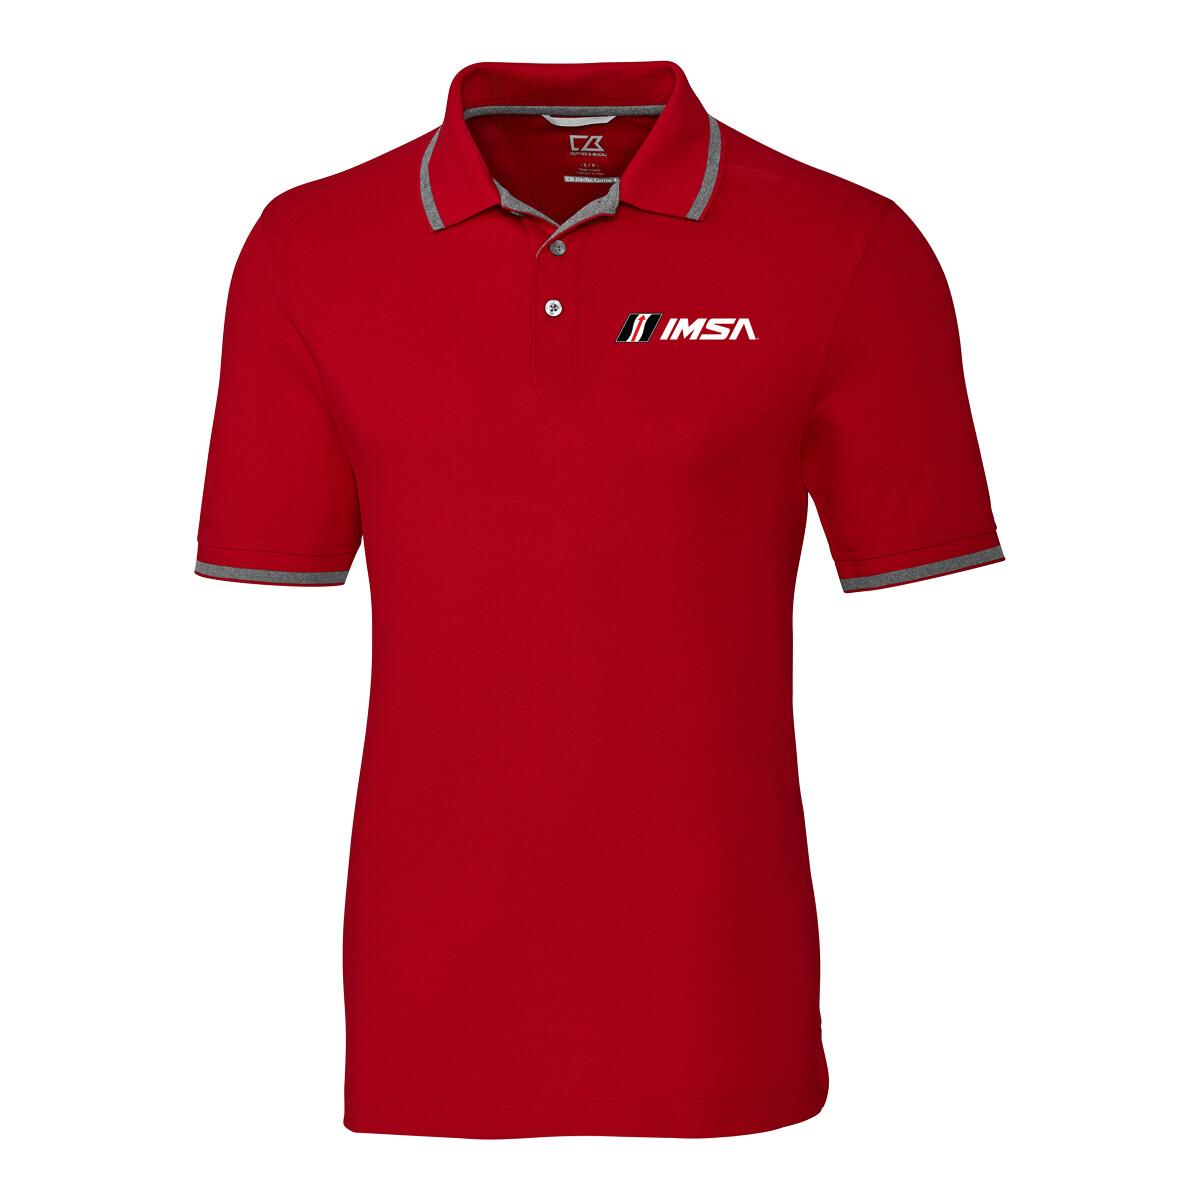 IMSA Advantage Tipped Cutter & Buck Polo- Cardinal Red/Silver